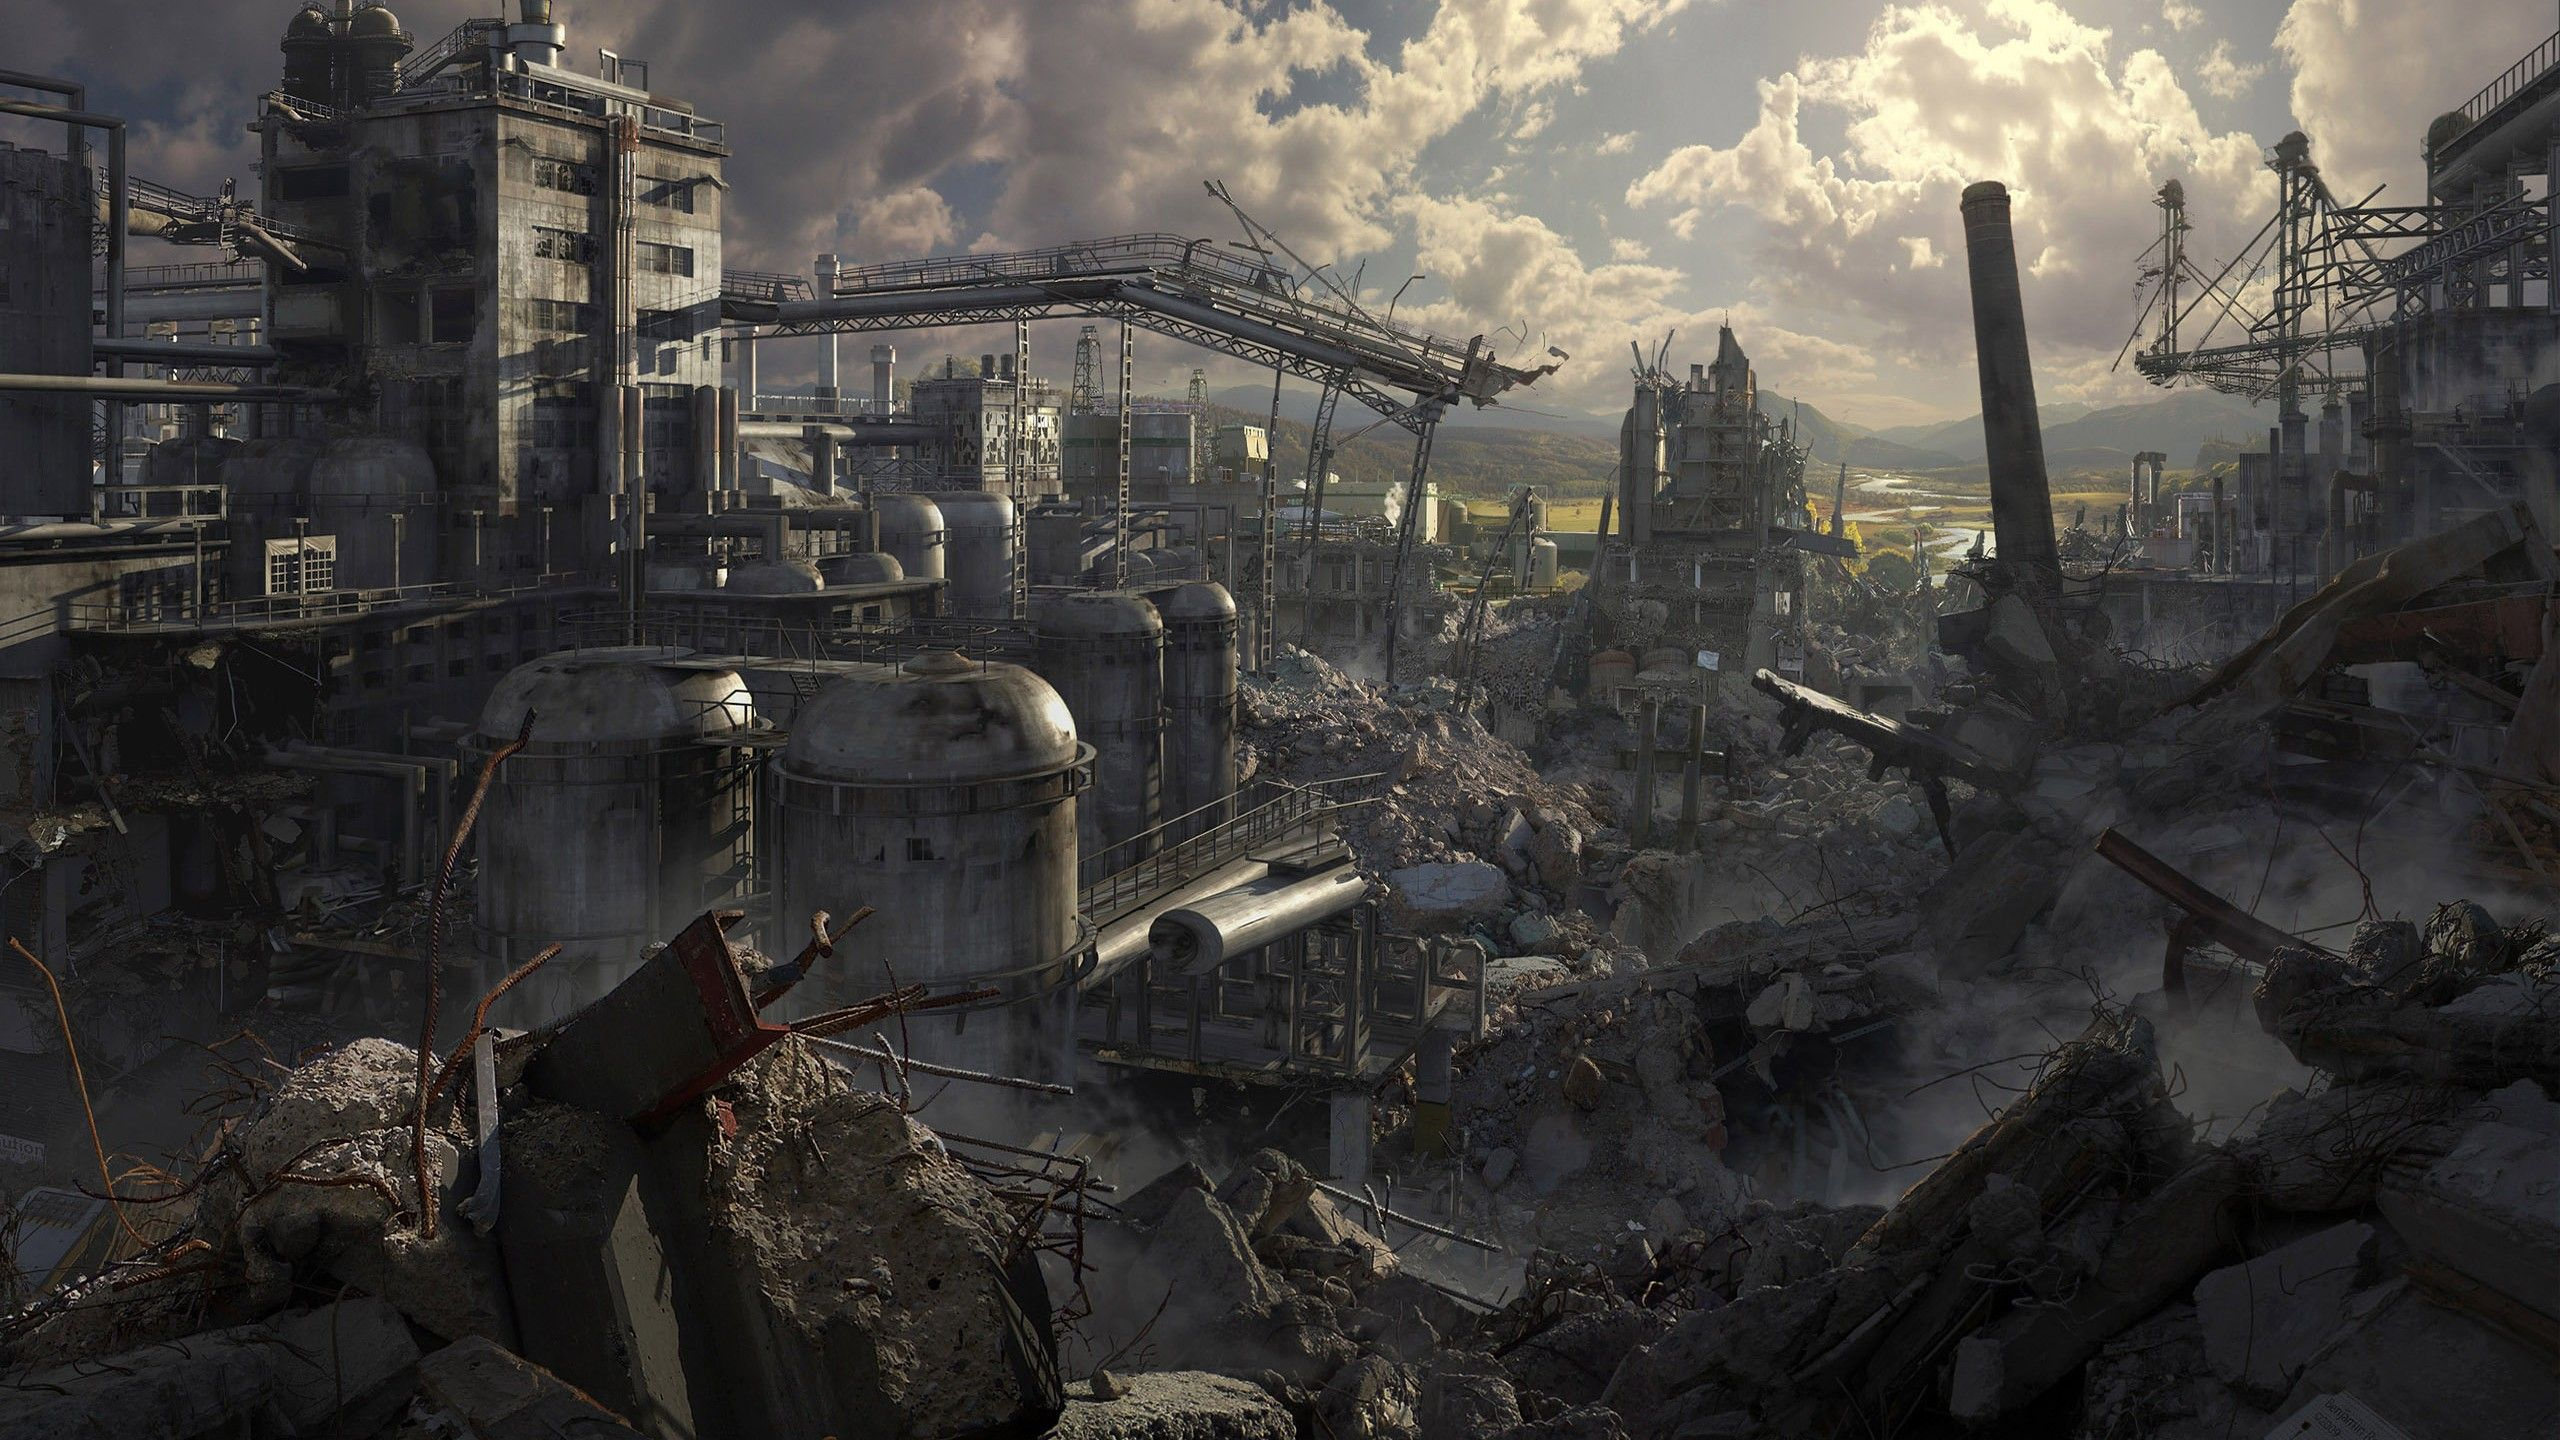 2560 X 1440 Wallpaper Dump Post Apocalyptic City Post Apocalyptic Art Apocalypse World